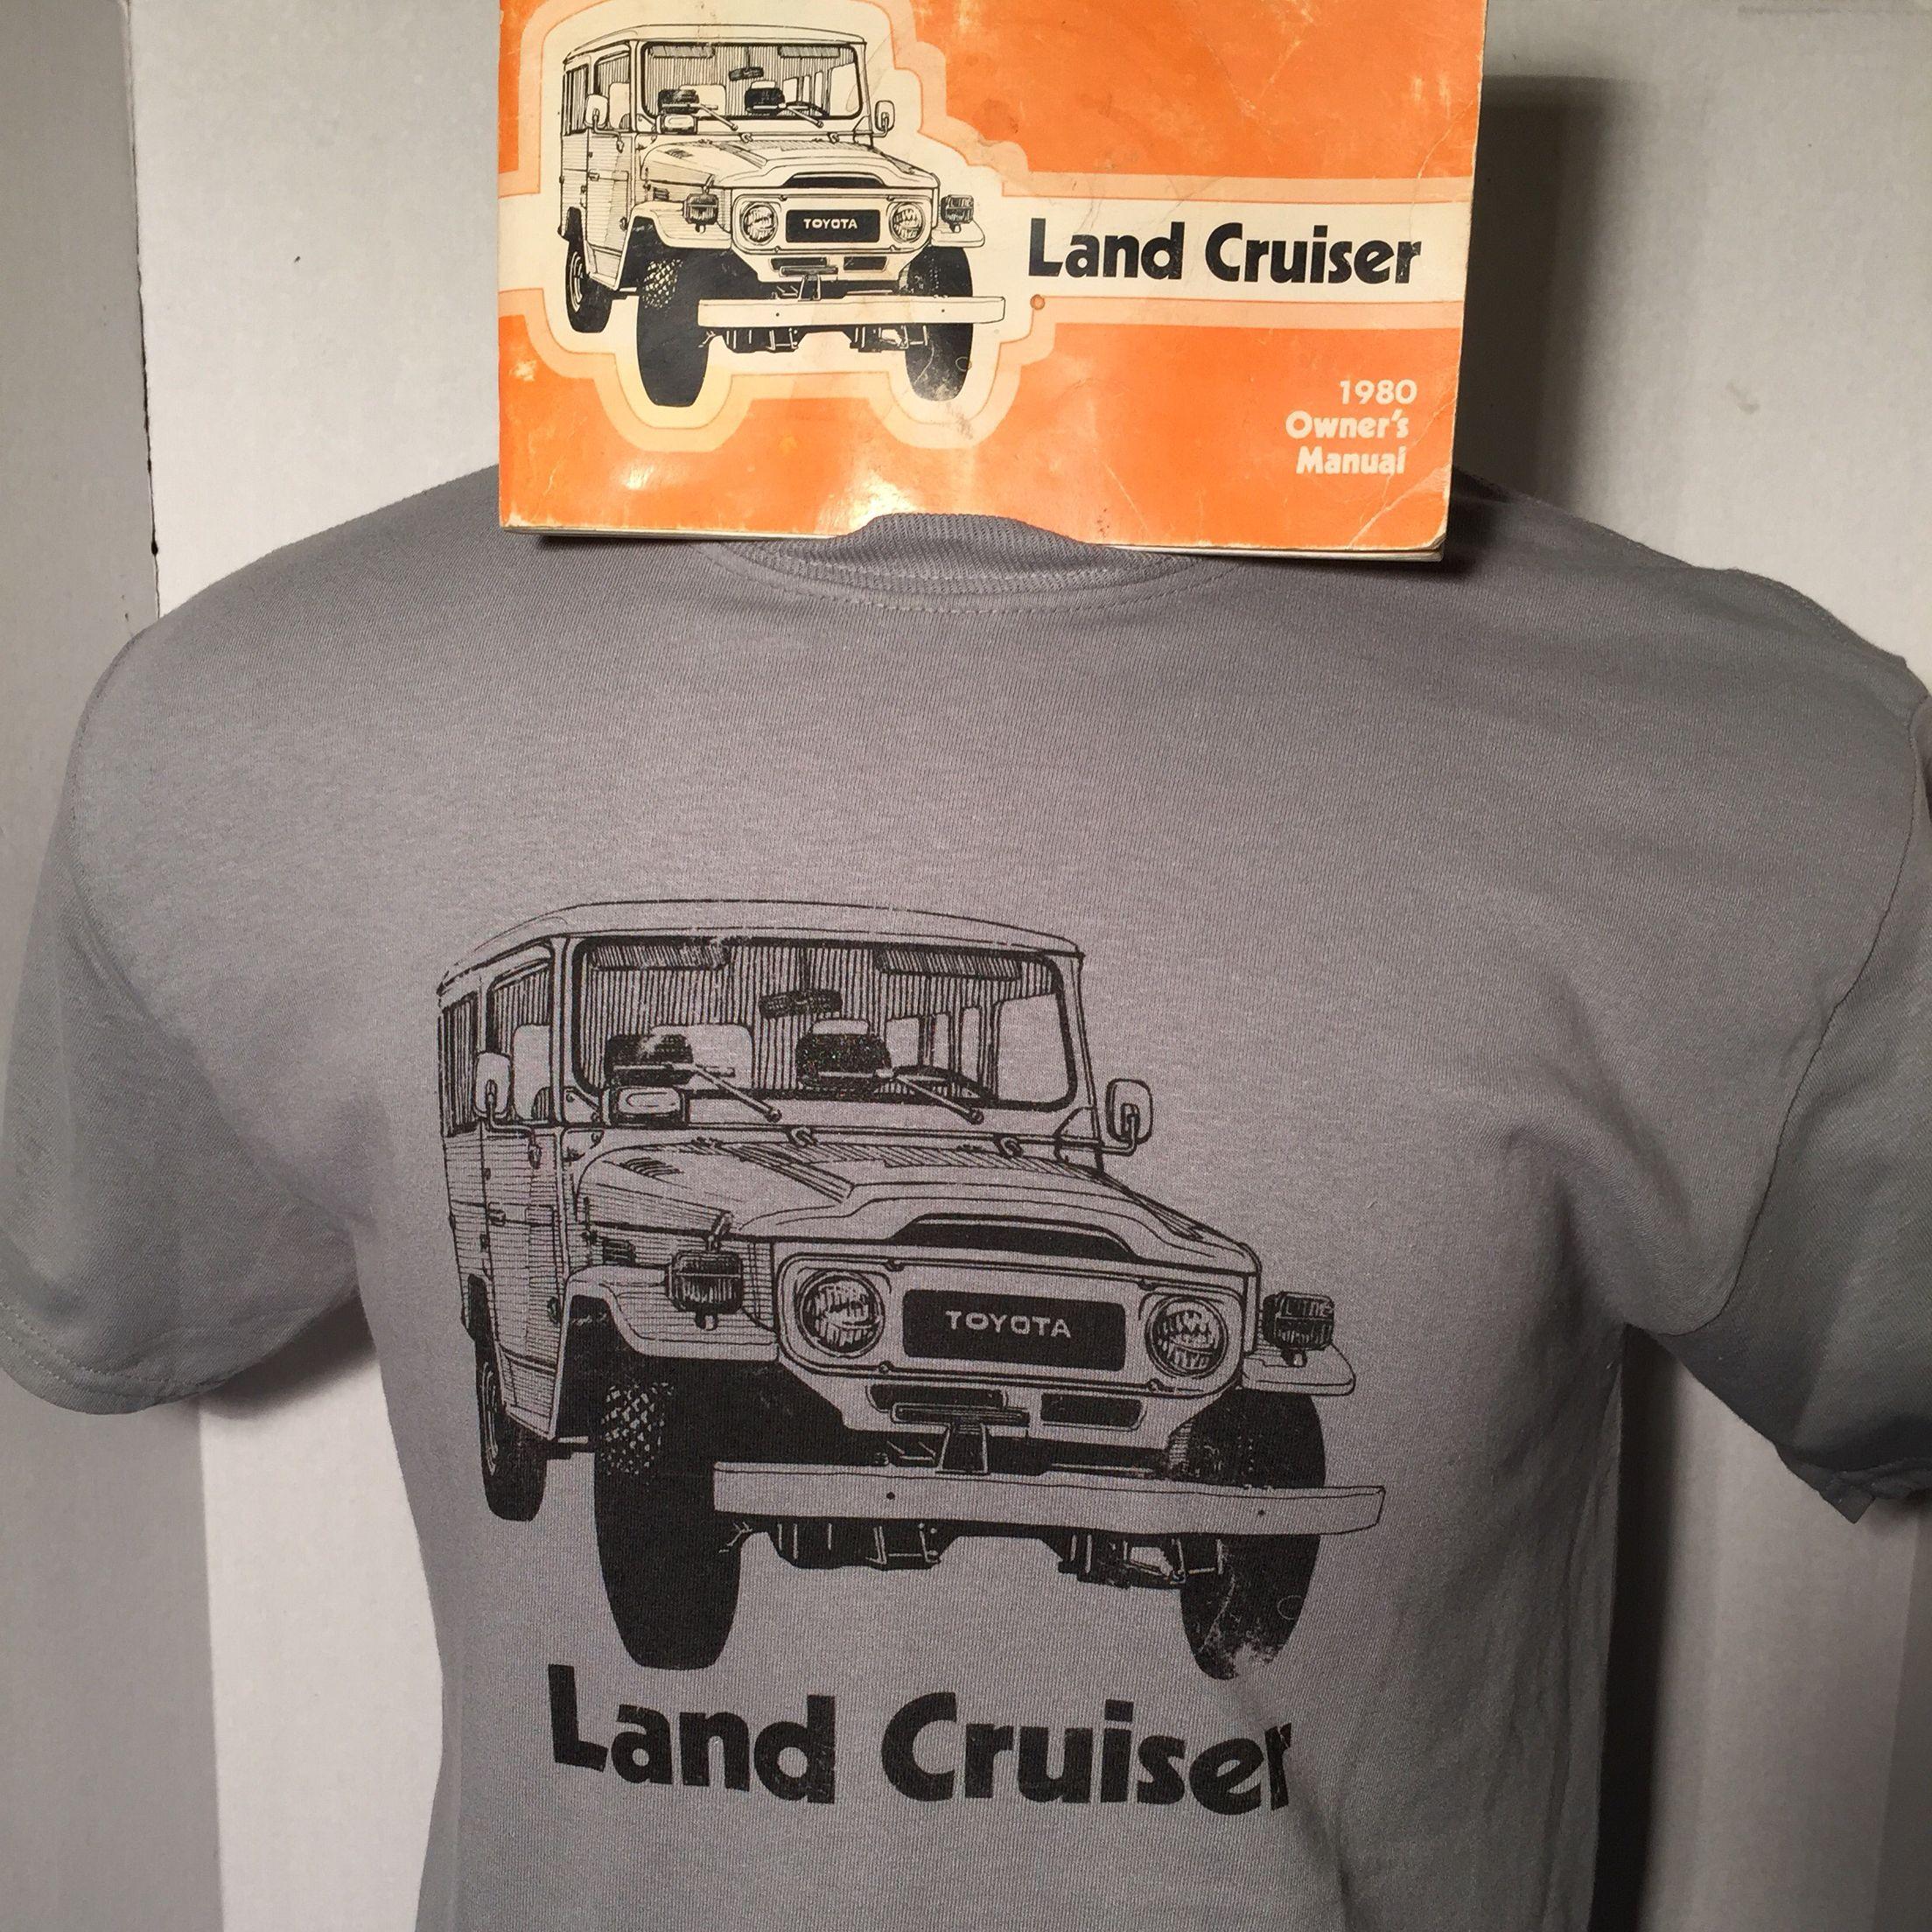 My Fj40 Distressed Owners Manual Tee Rjcruisers Com Toyota Land Cruiser Land Cruiser Fj40